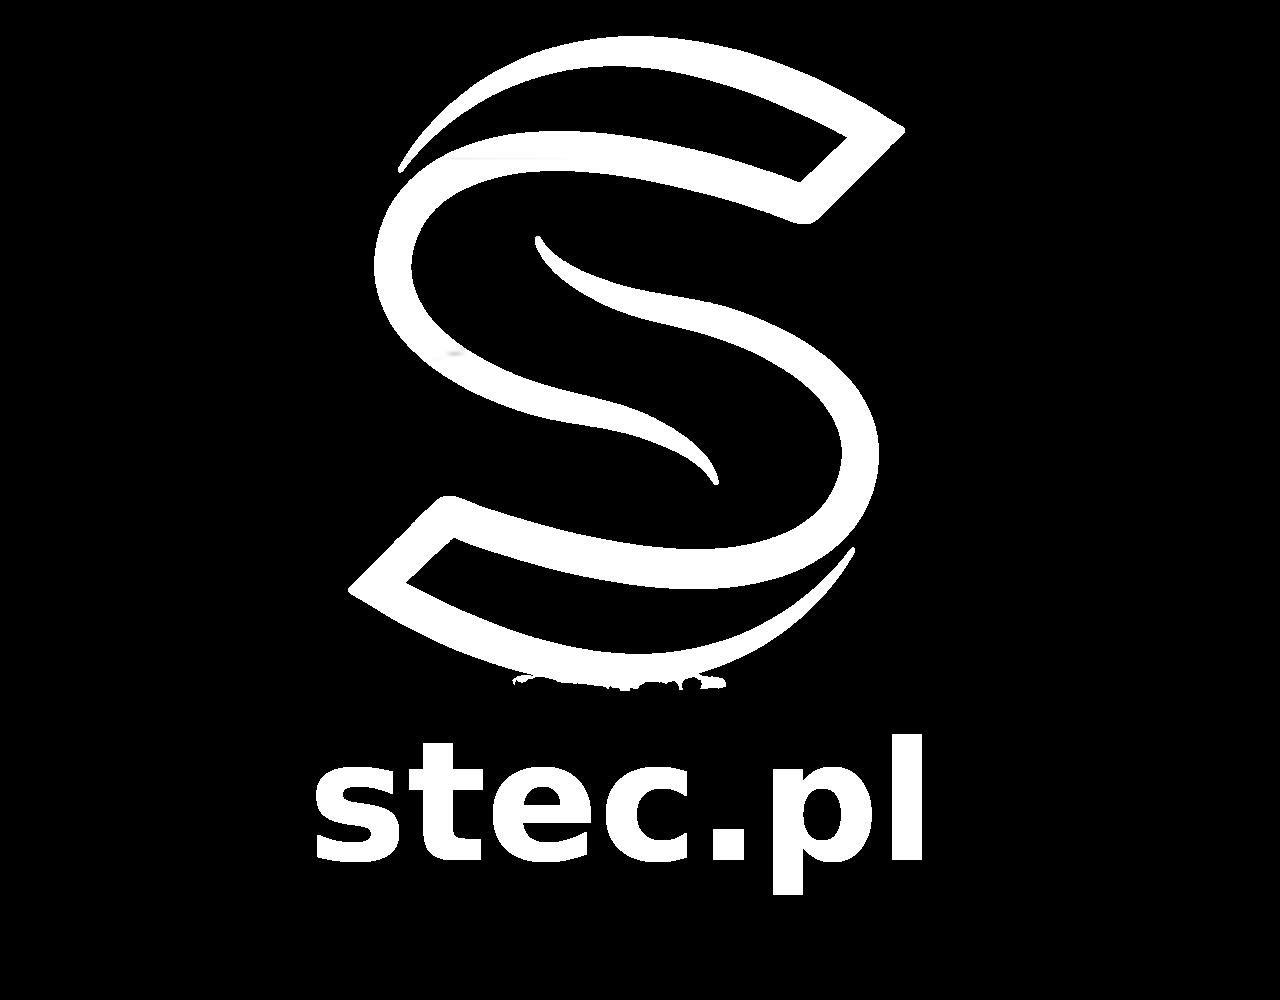 stec.pl